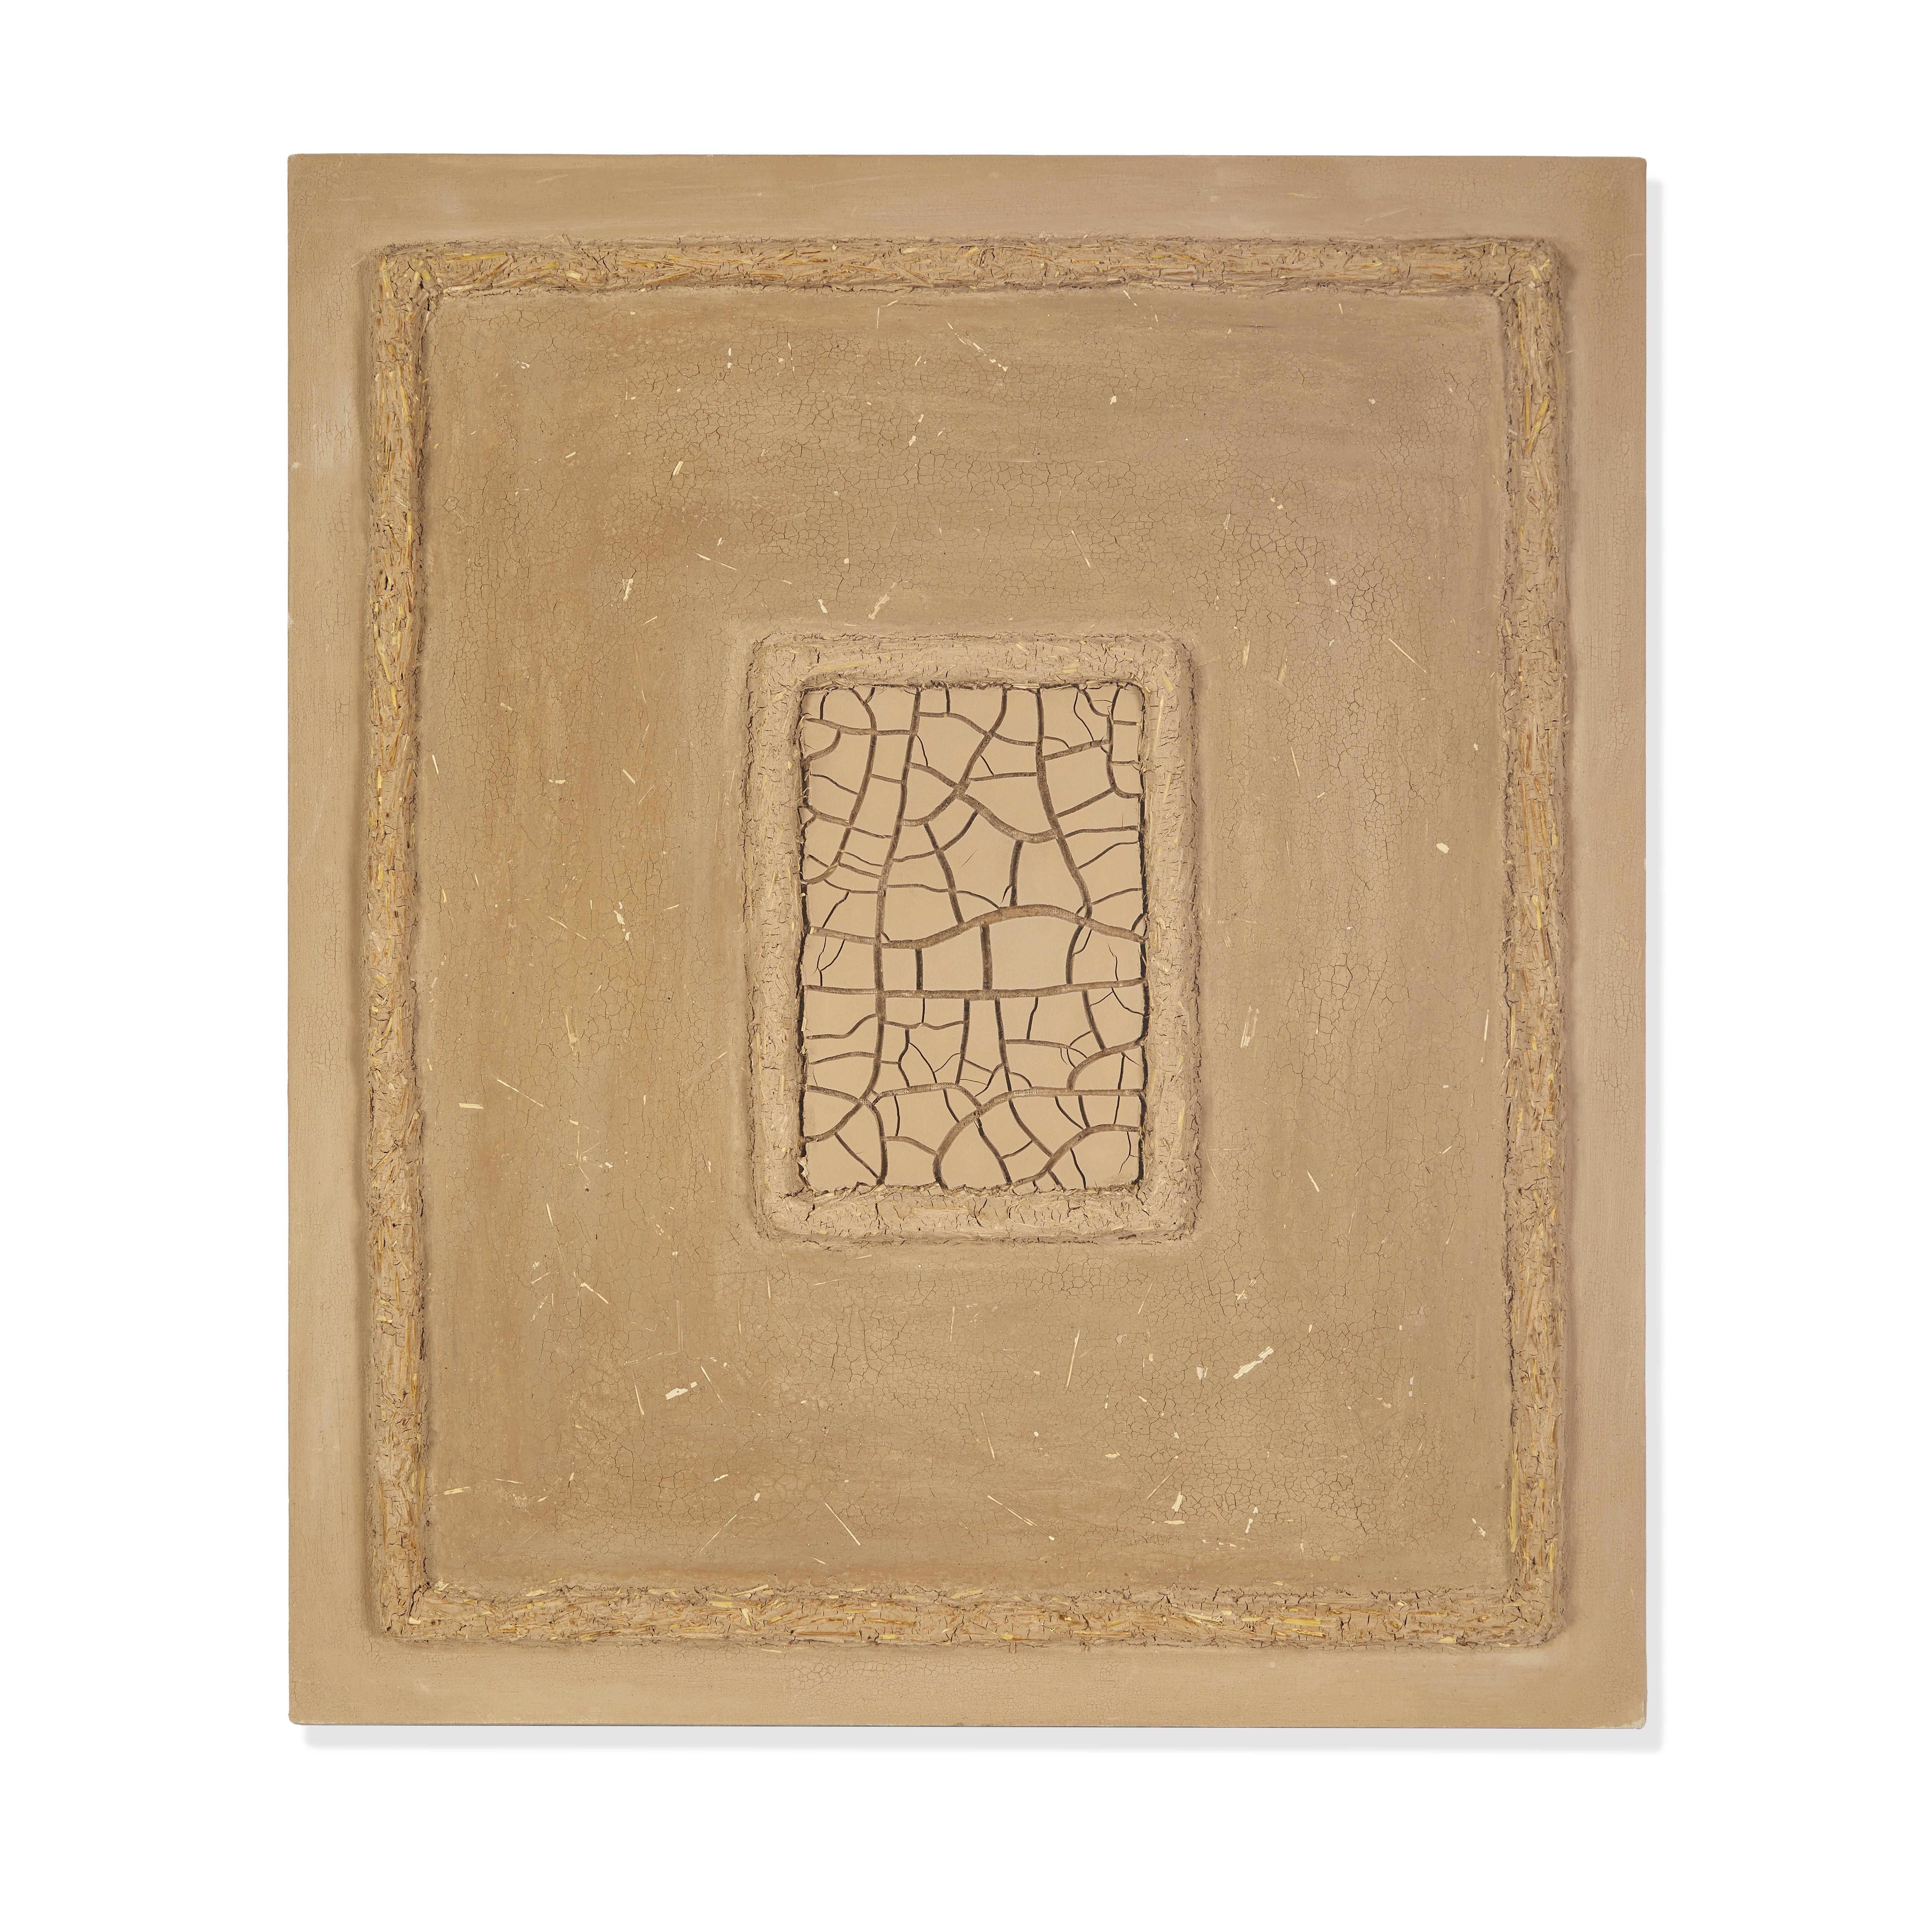 Marcos Grigorian (Iran, 1925-2007) Desert No. 3